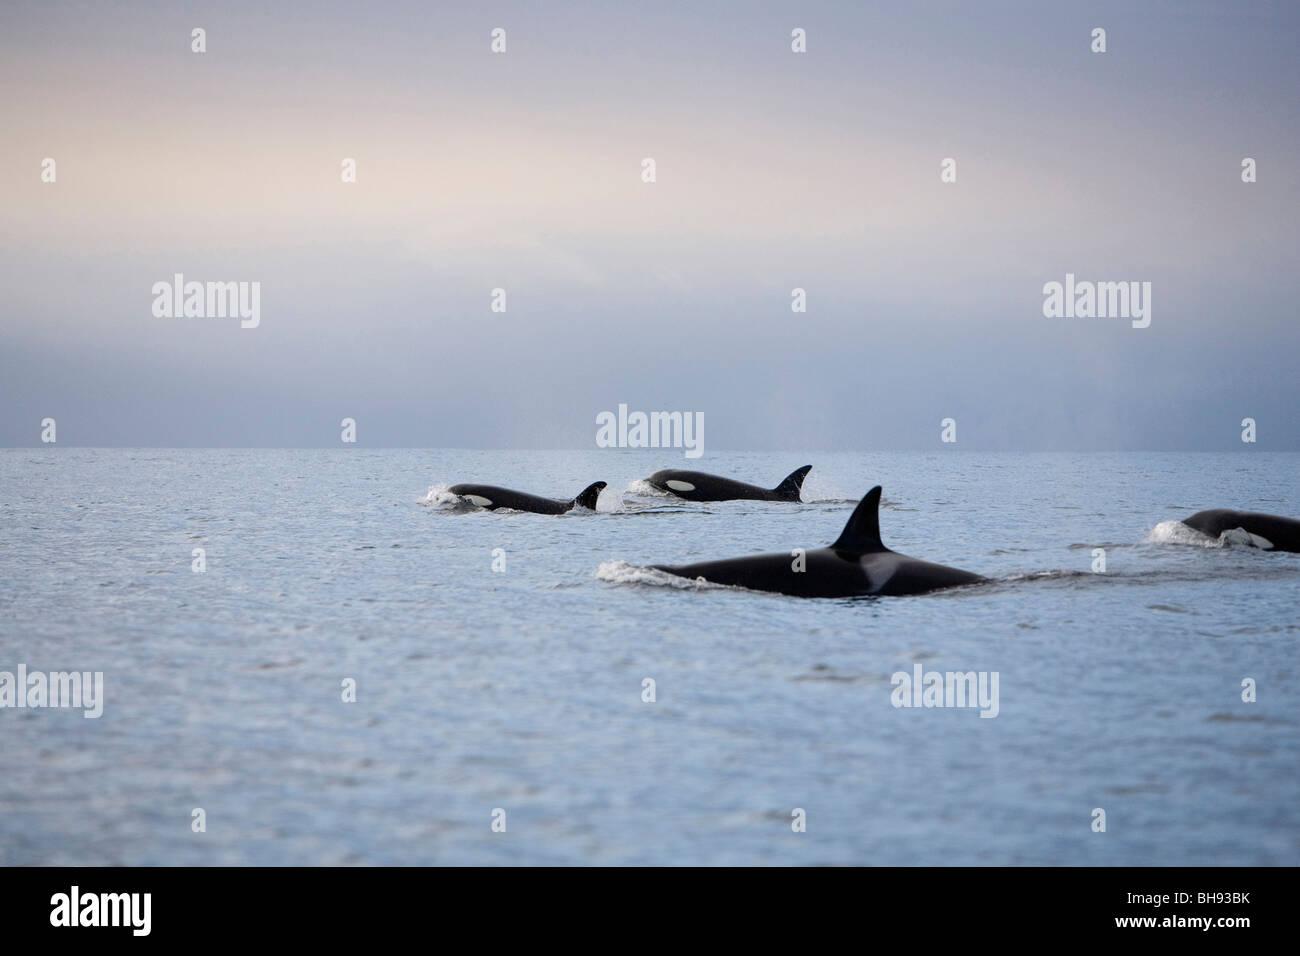 Group of Killer Whales, Orcinus orca, Solvaer, Vestfjord, Lofoten, Norway - Stock Image